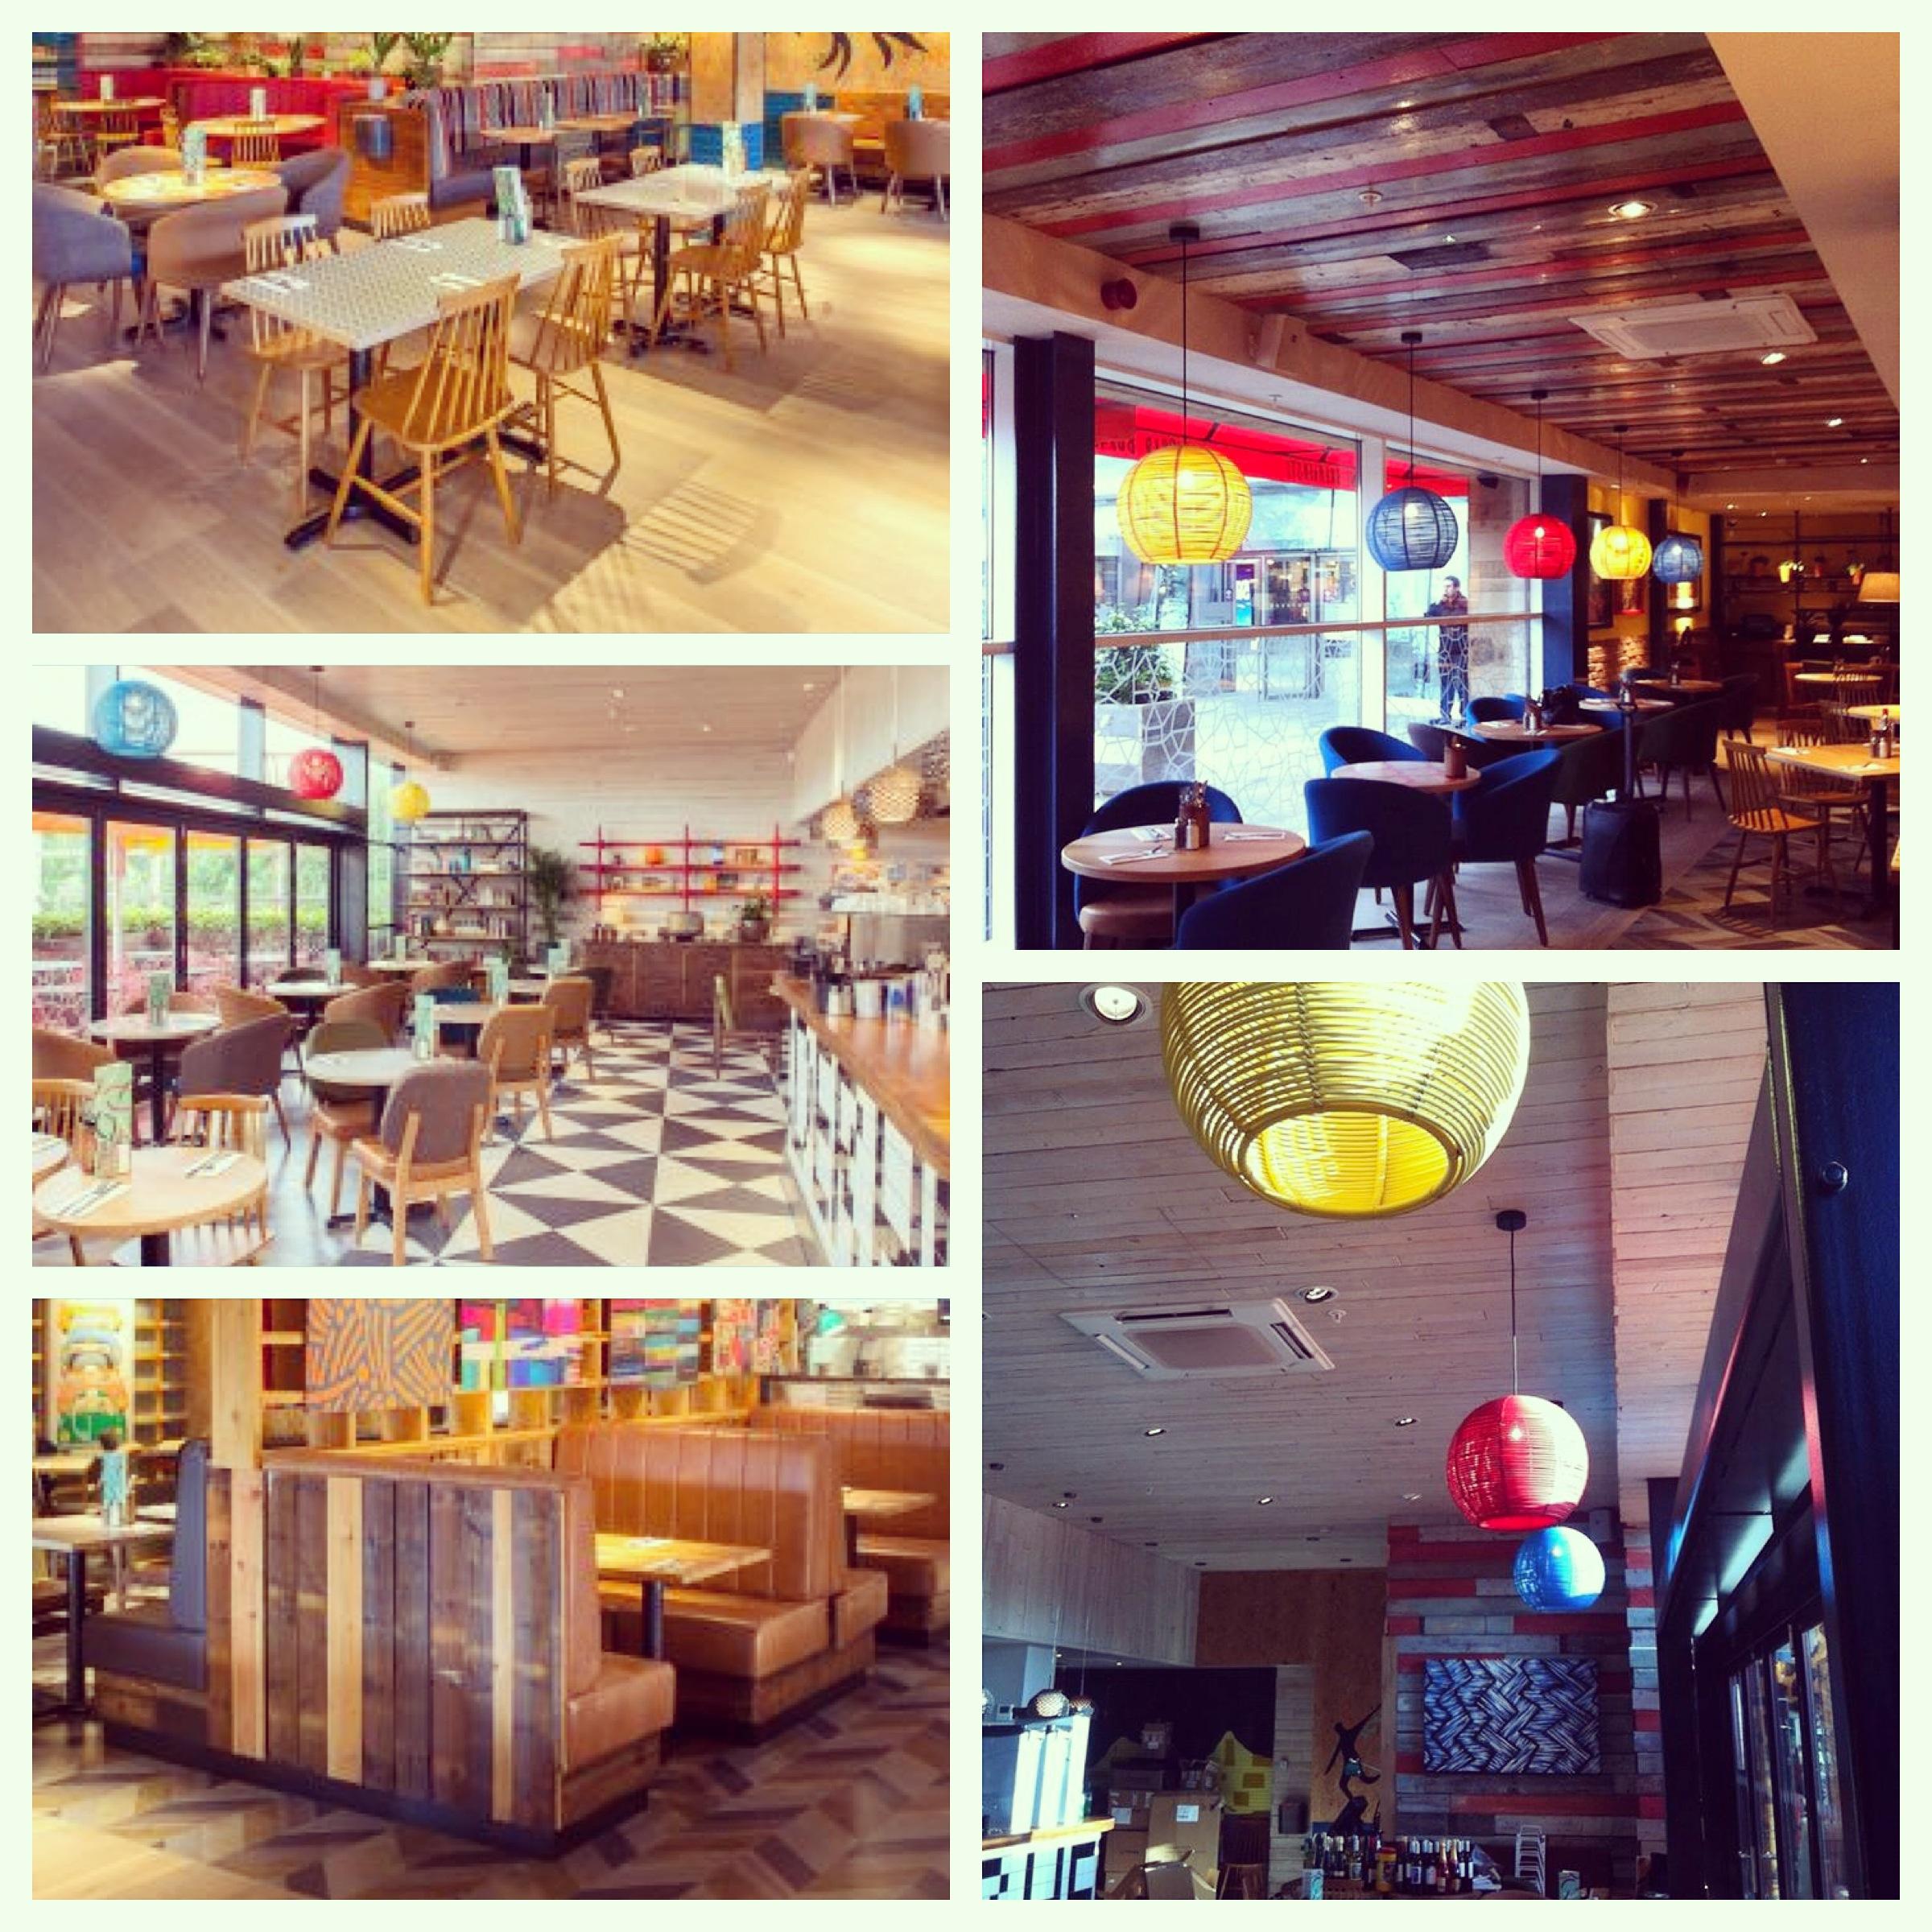 Giraffe Concept Restaurant S New Restau At Glasgow Scotland Newcastle Dark Sangha Lighting Enigma Interiordesign Project United Kingdom Uk